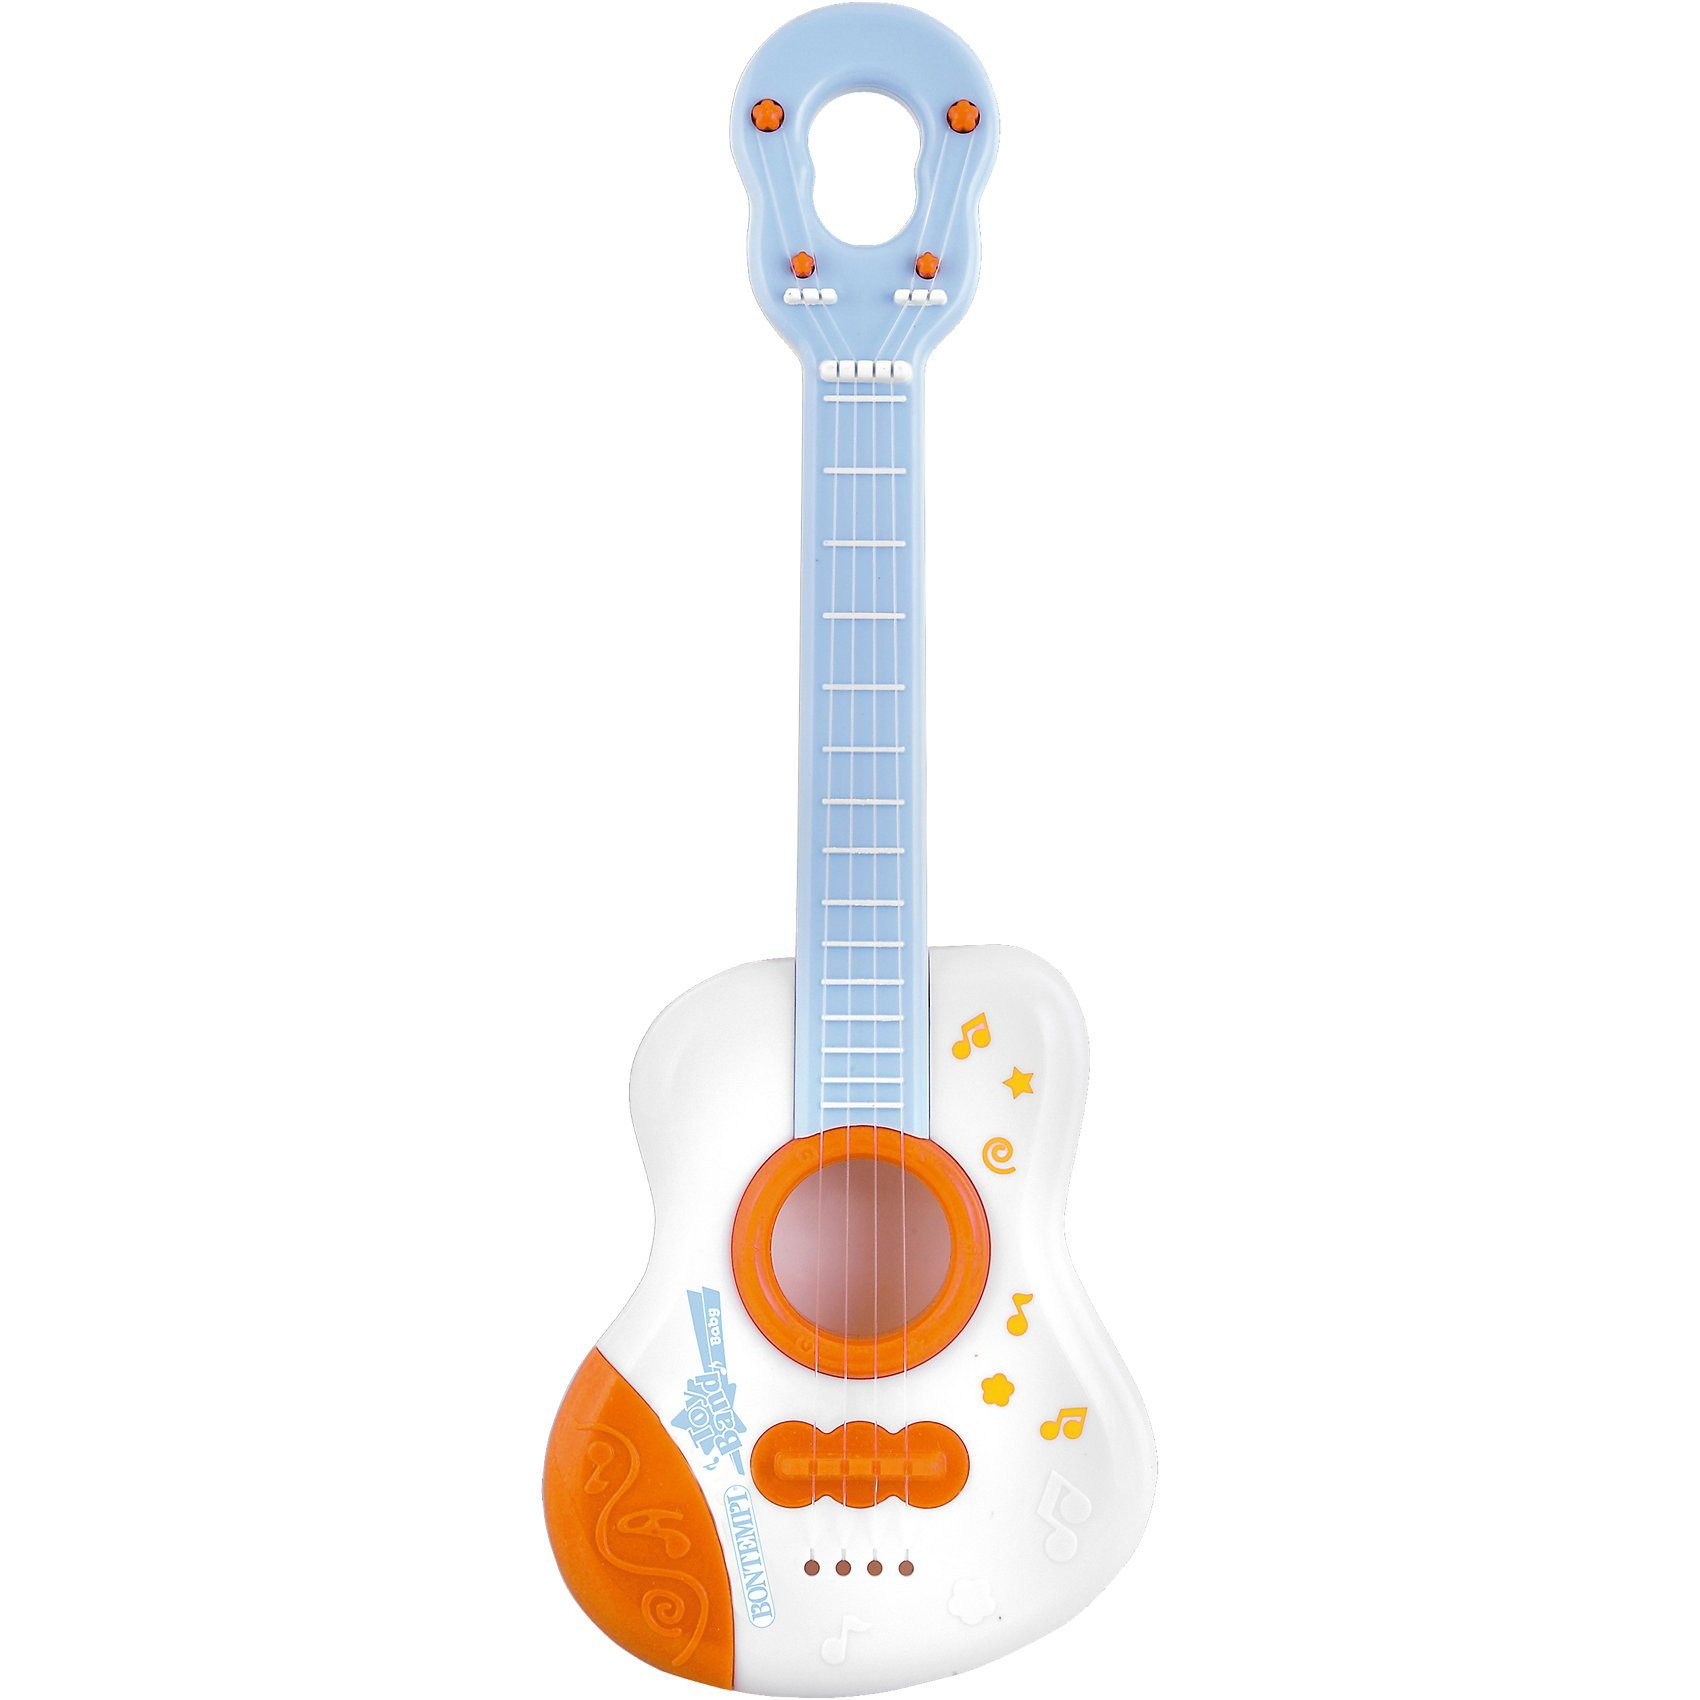 Bontempi Baby Gitarre mit 4 Nylon-Seiten